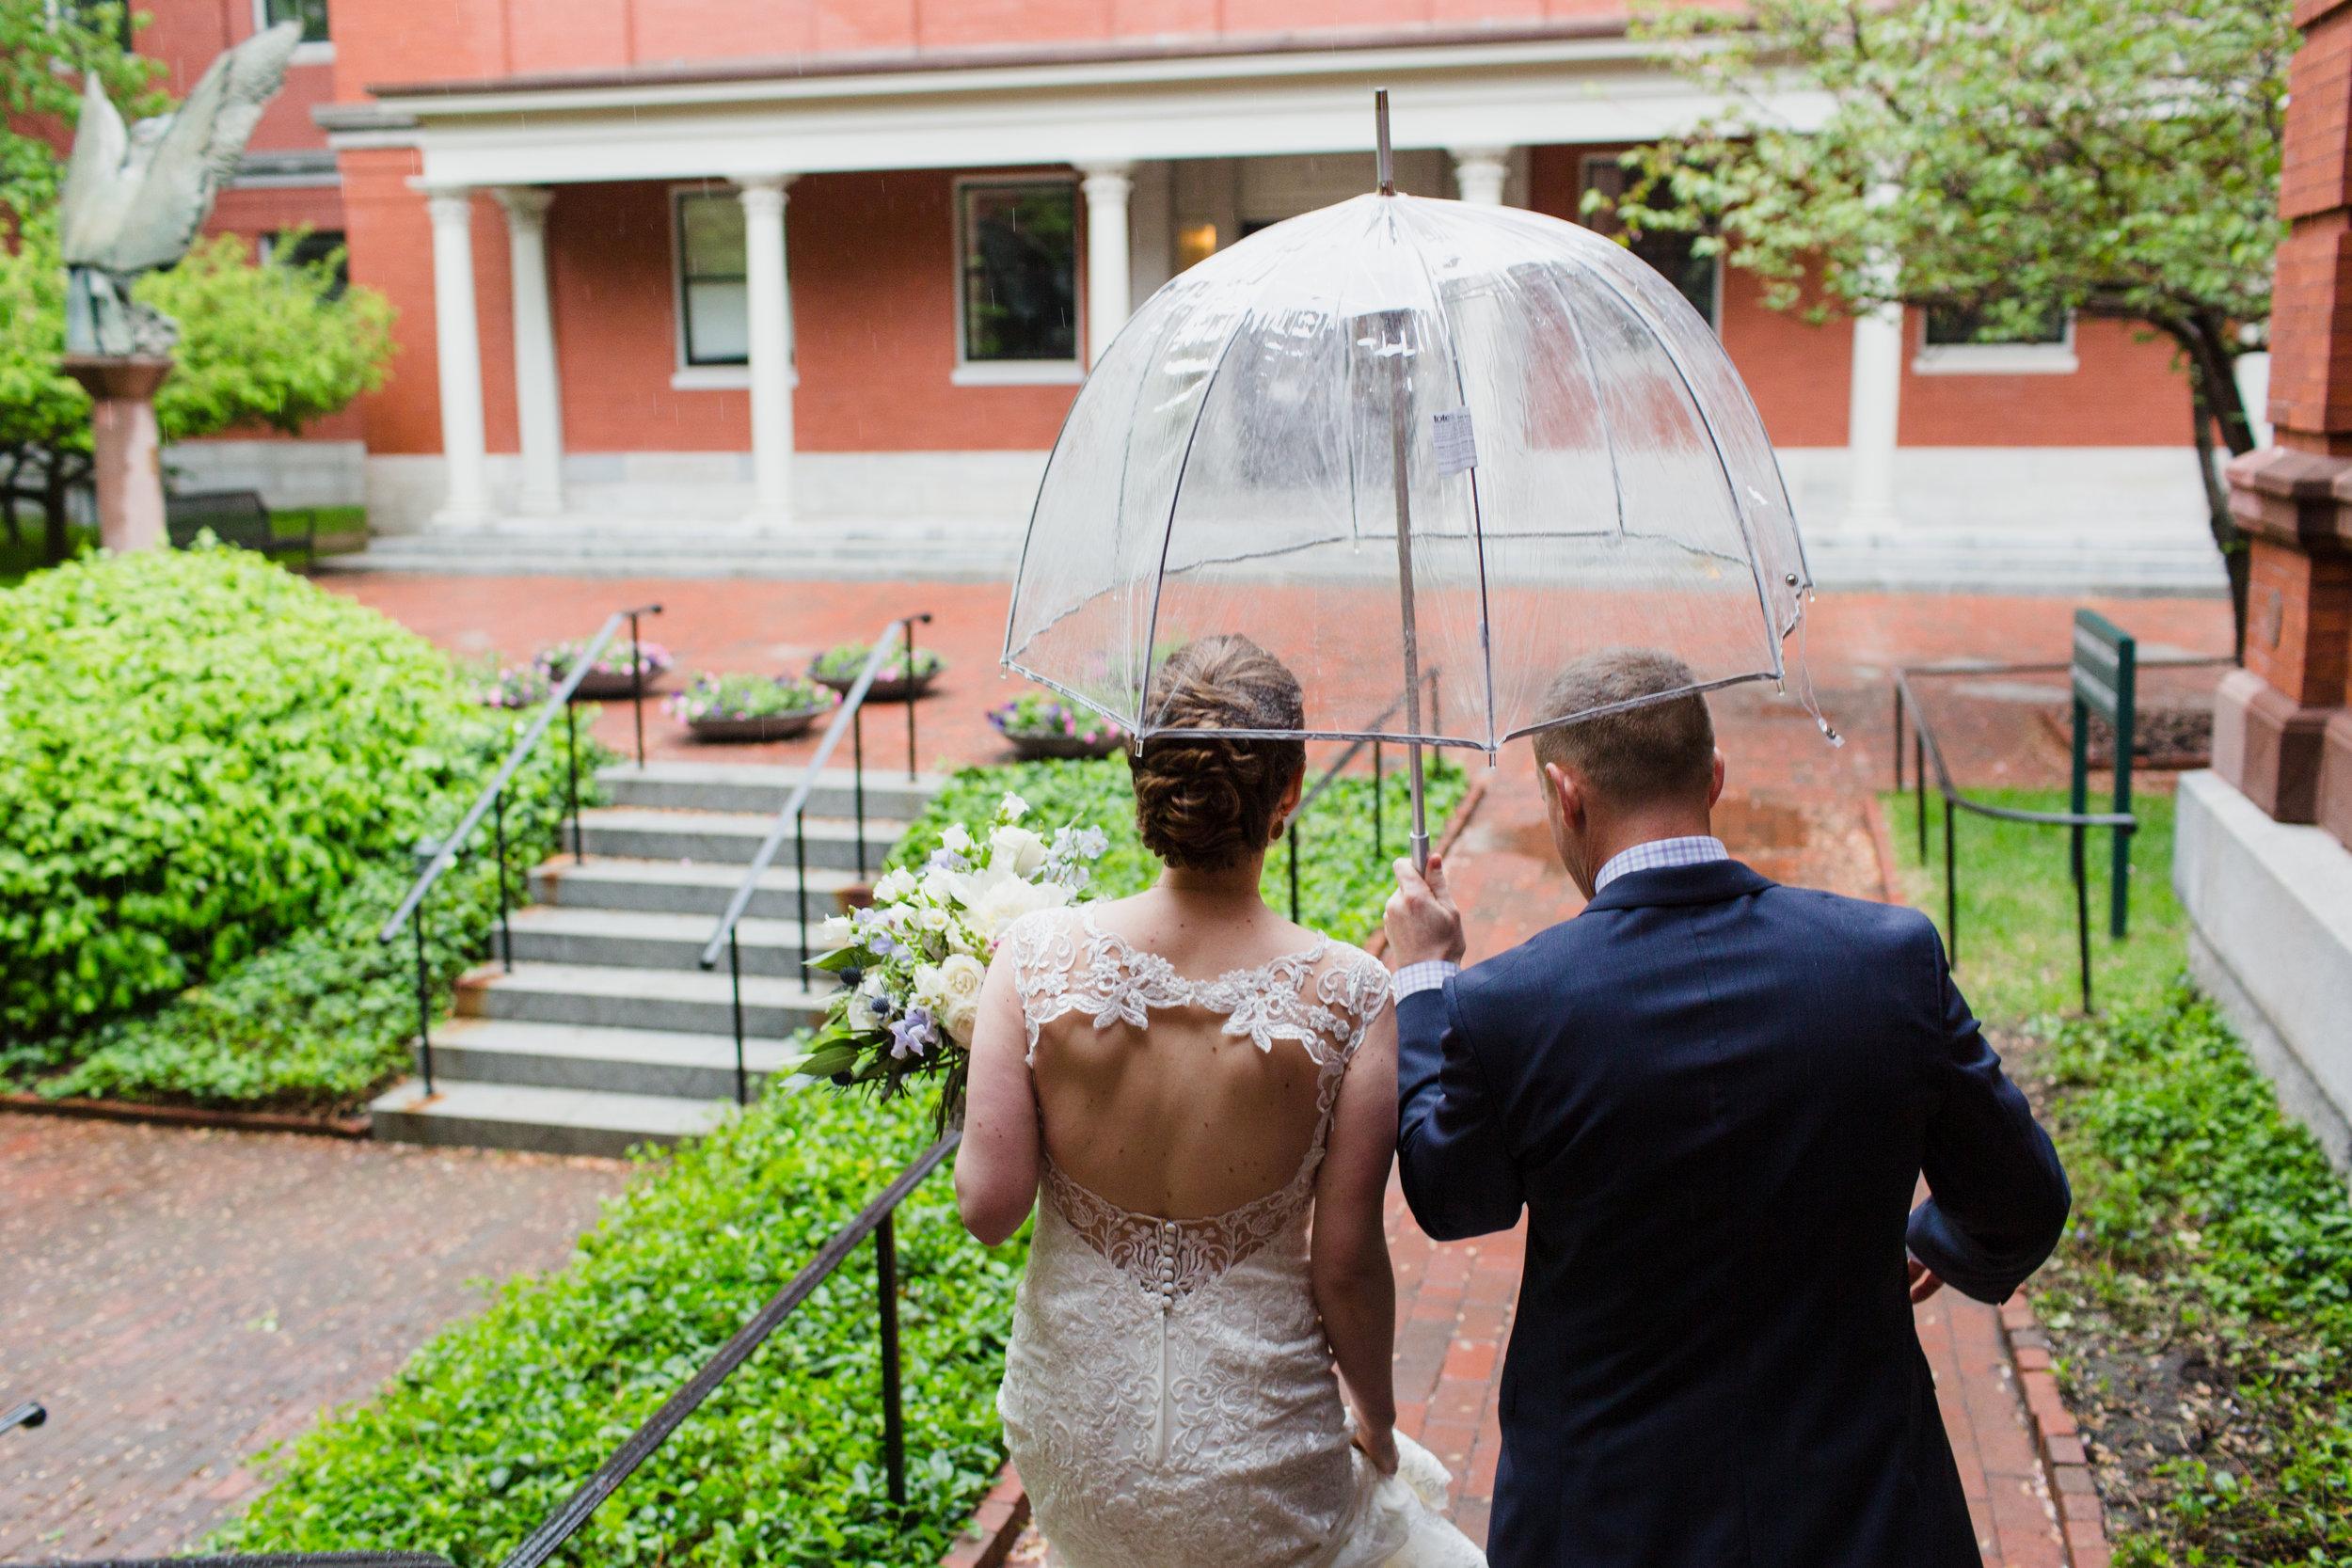 cambridge-multi-cultural-arts-center-wedding-66.JPG